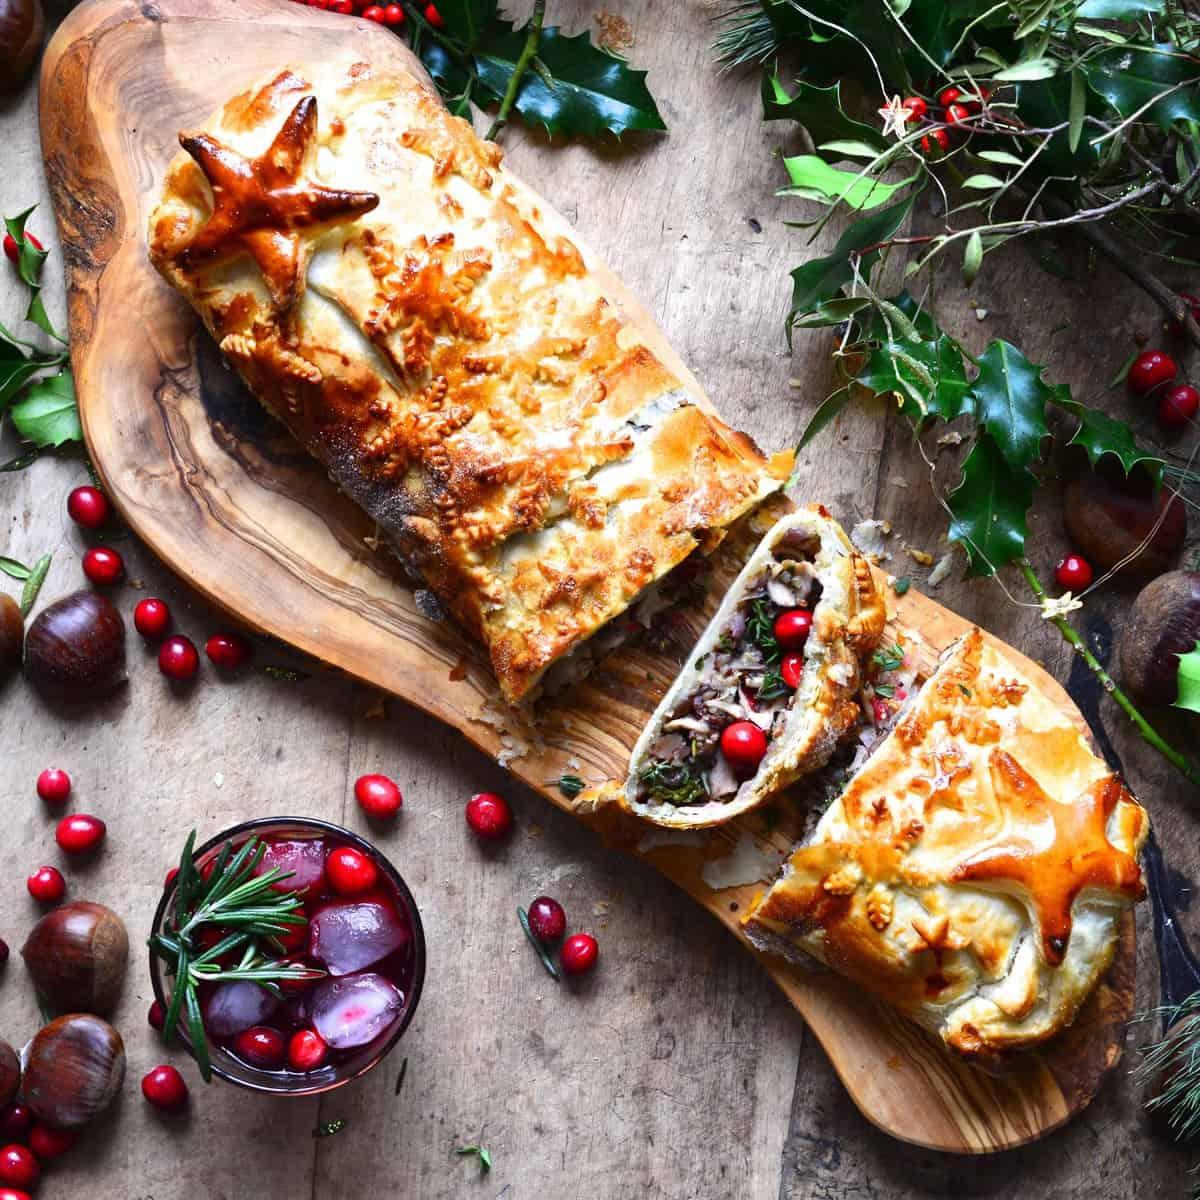 Vegan christmas mushroom wellington recipe , perfect for a vegan christmas dinner - with a mushroom, chestnut, cranberry, kale and quinoa filling.